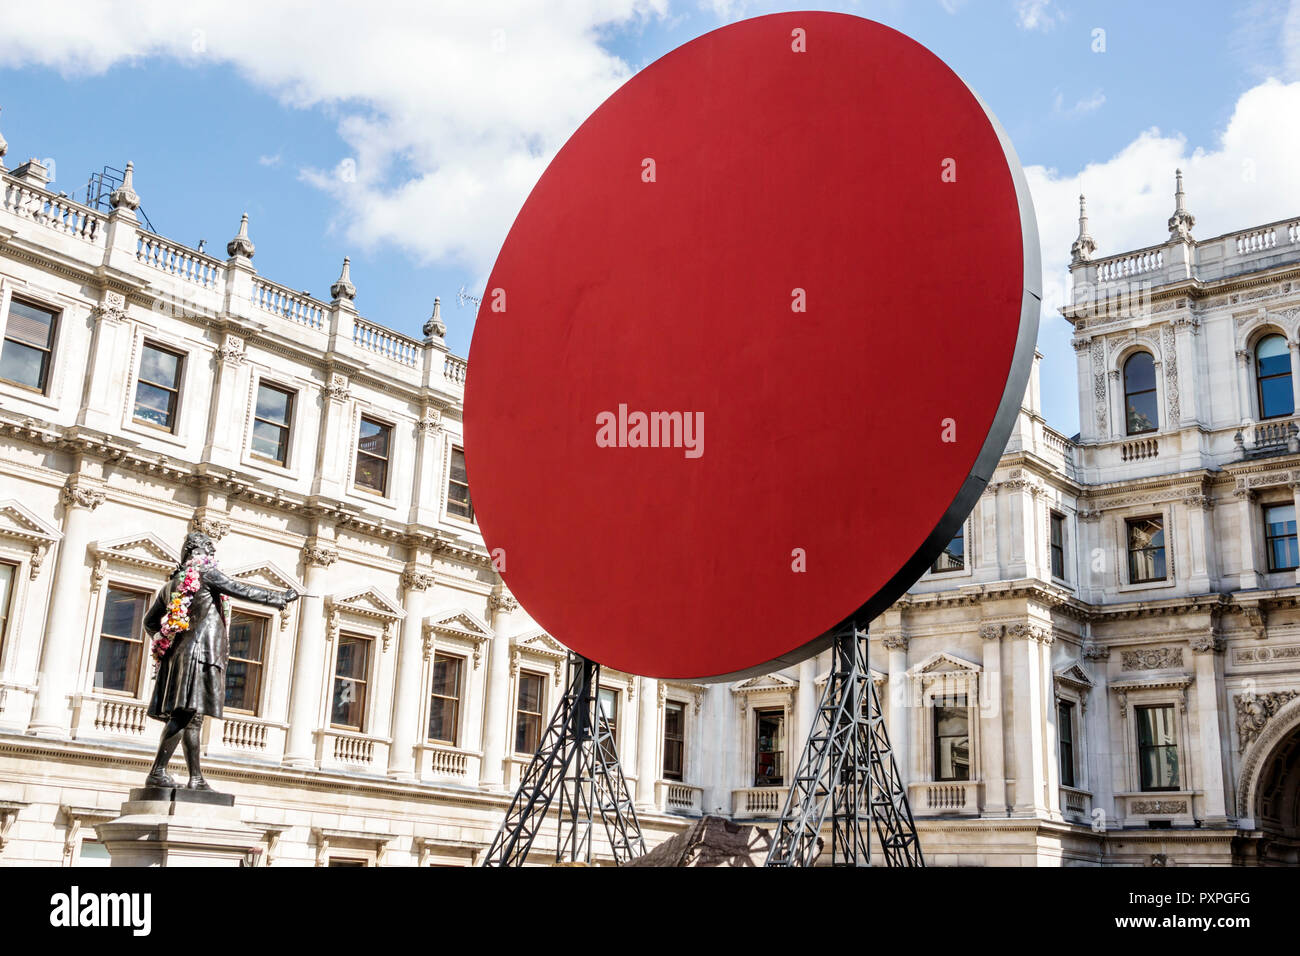 Londres Angleterre Royaume-Uni Grande-bretagne Piccadilly Mayfair Burlington House Royal Academy of Arts installation extérieure d'une sculpture contemporaine Photo Stock